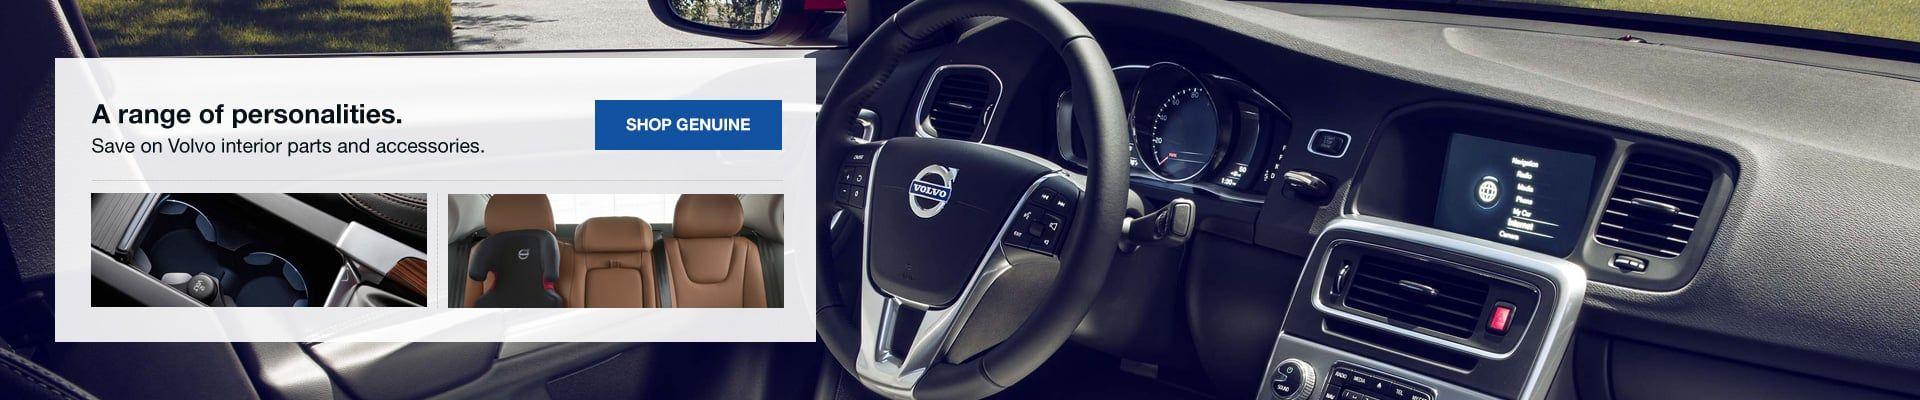 Volvo Interior Parts & Accessories